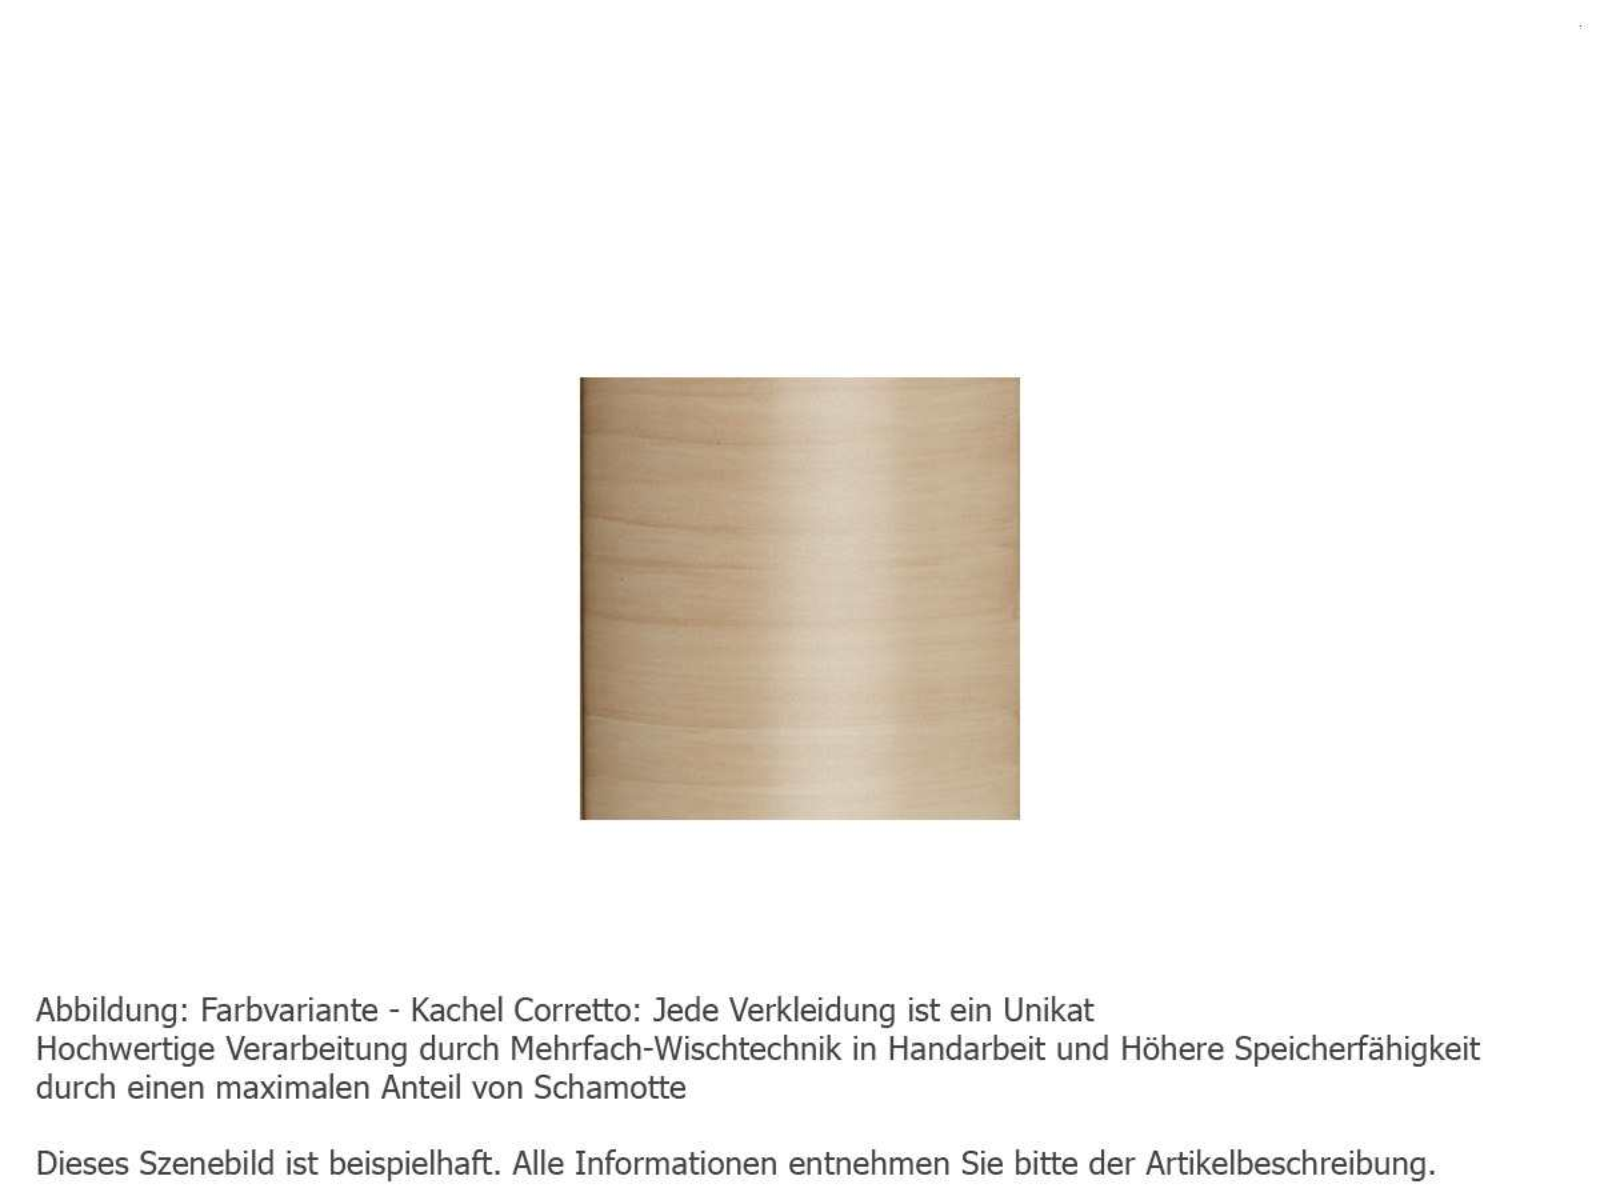 Justus Island 5 – 4875 70 Kaminofen Keramik Corretto Korpus Stahl Schwarz